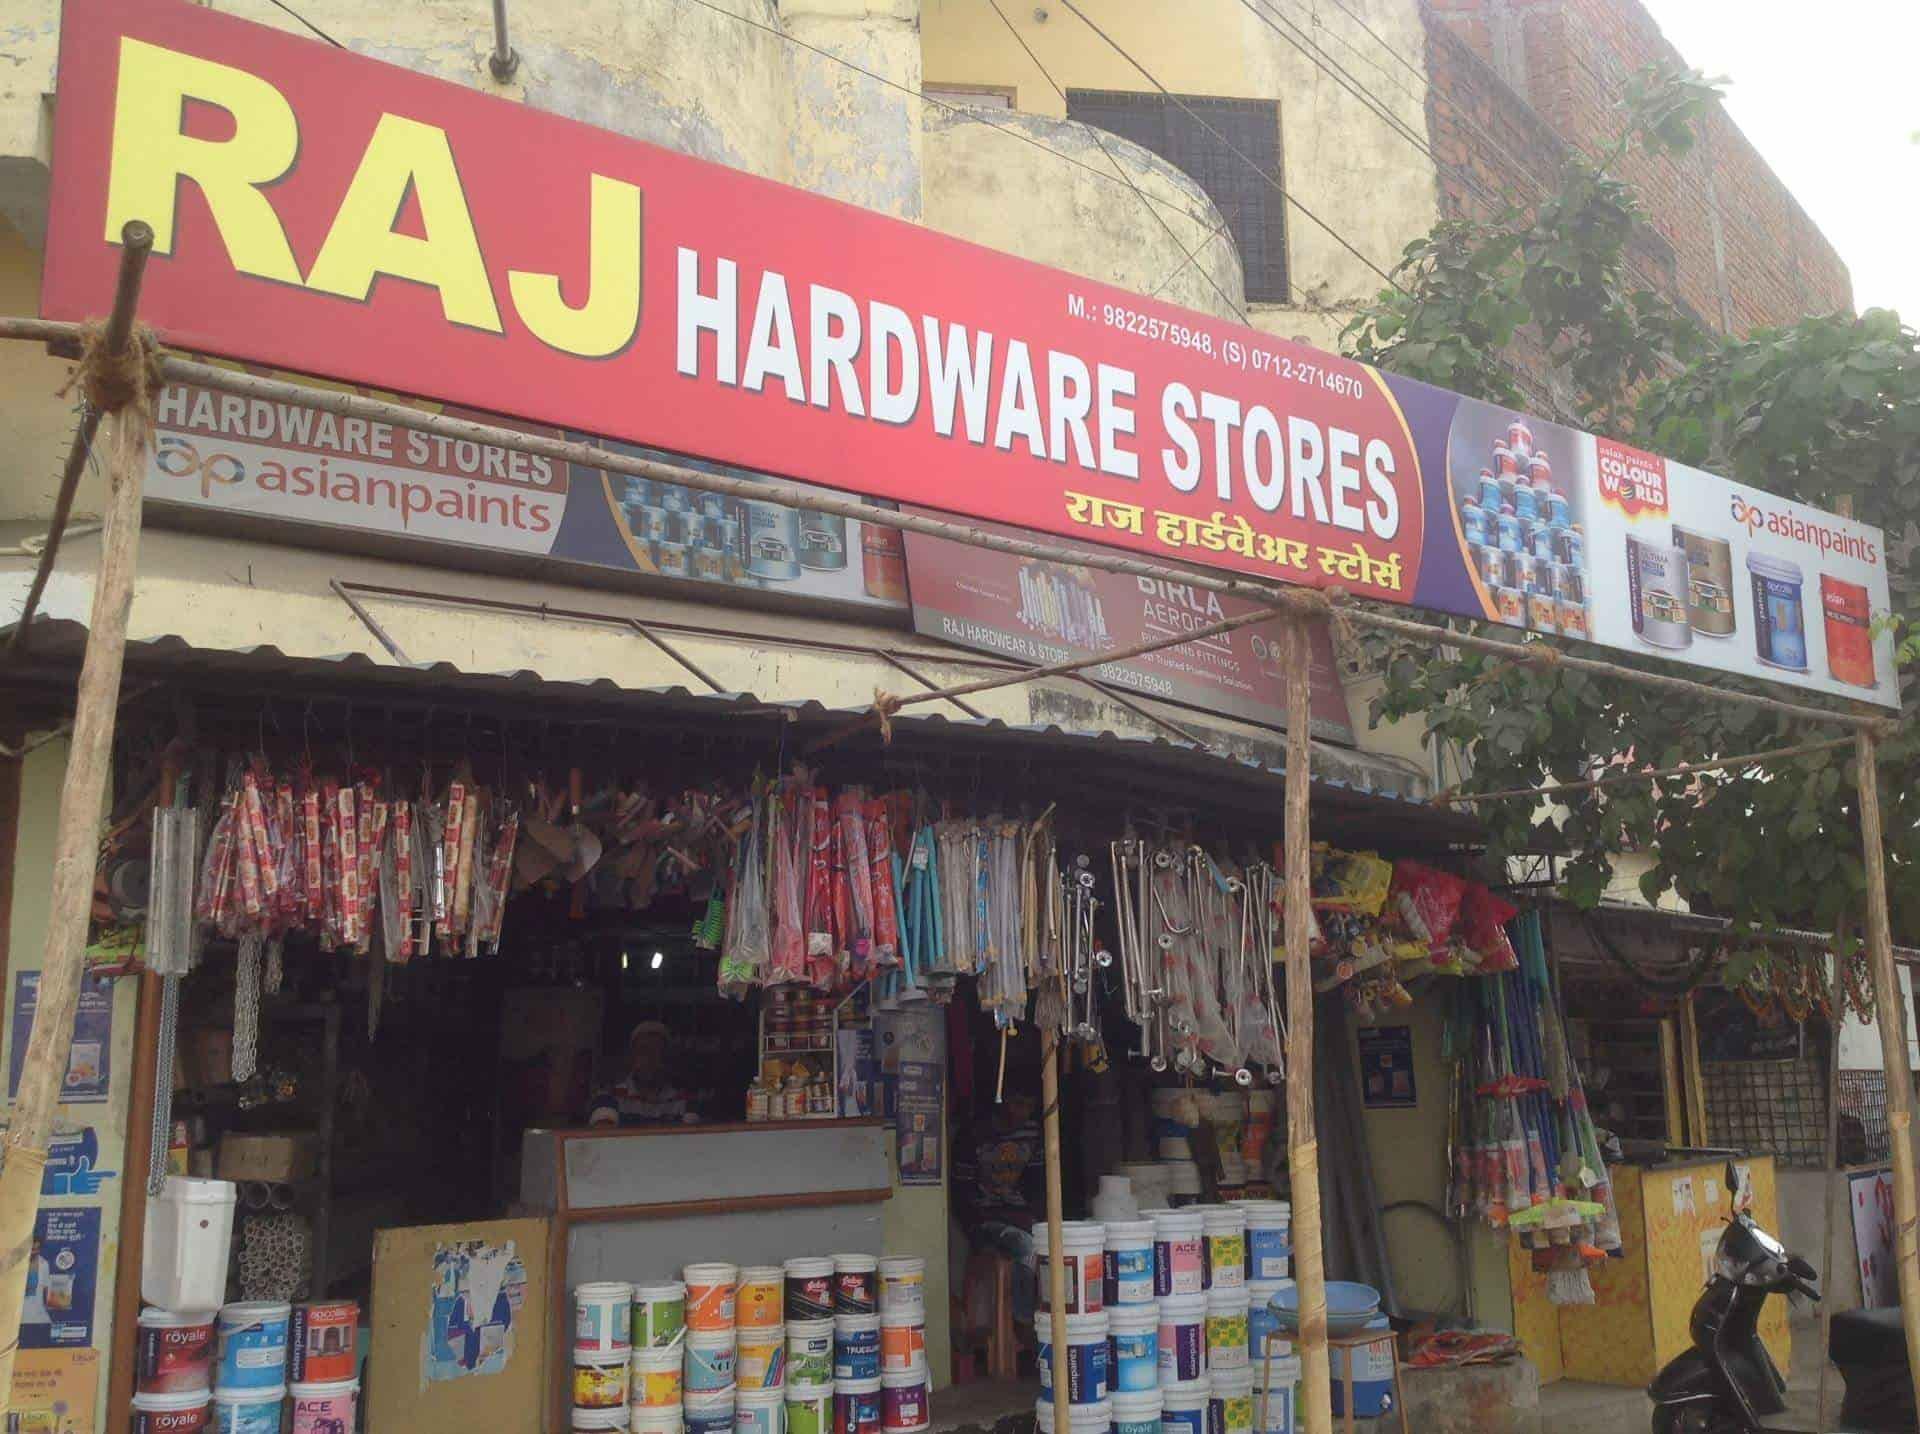 Raj Hardware Stores Photos, Nandanvan Colony, Nagpur- Pictures